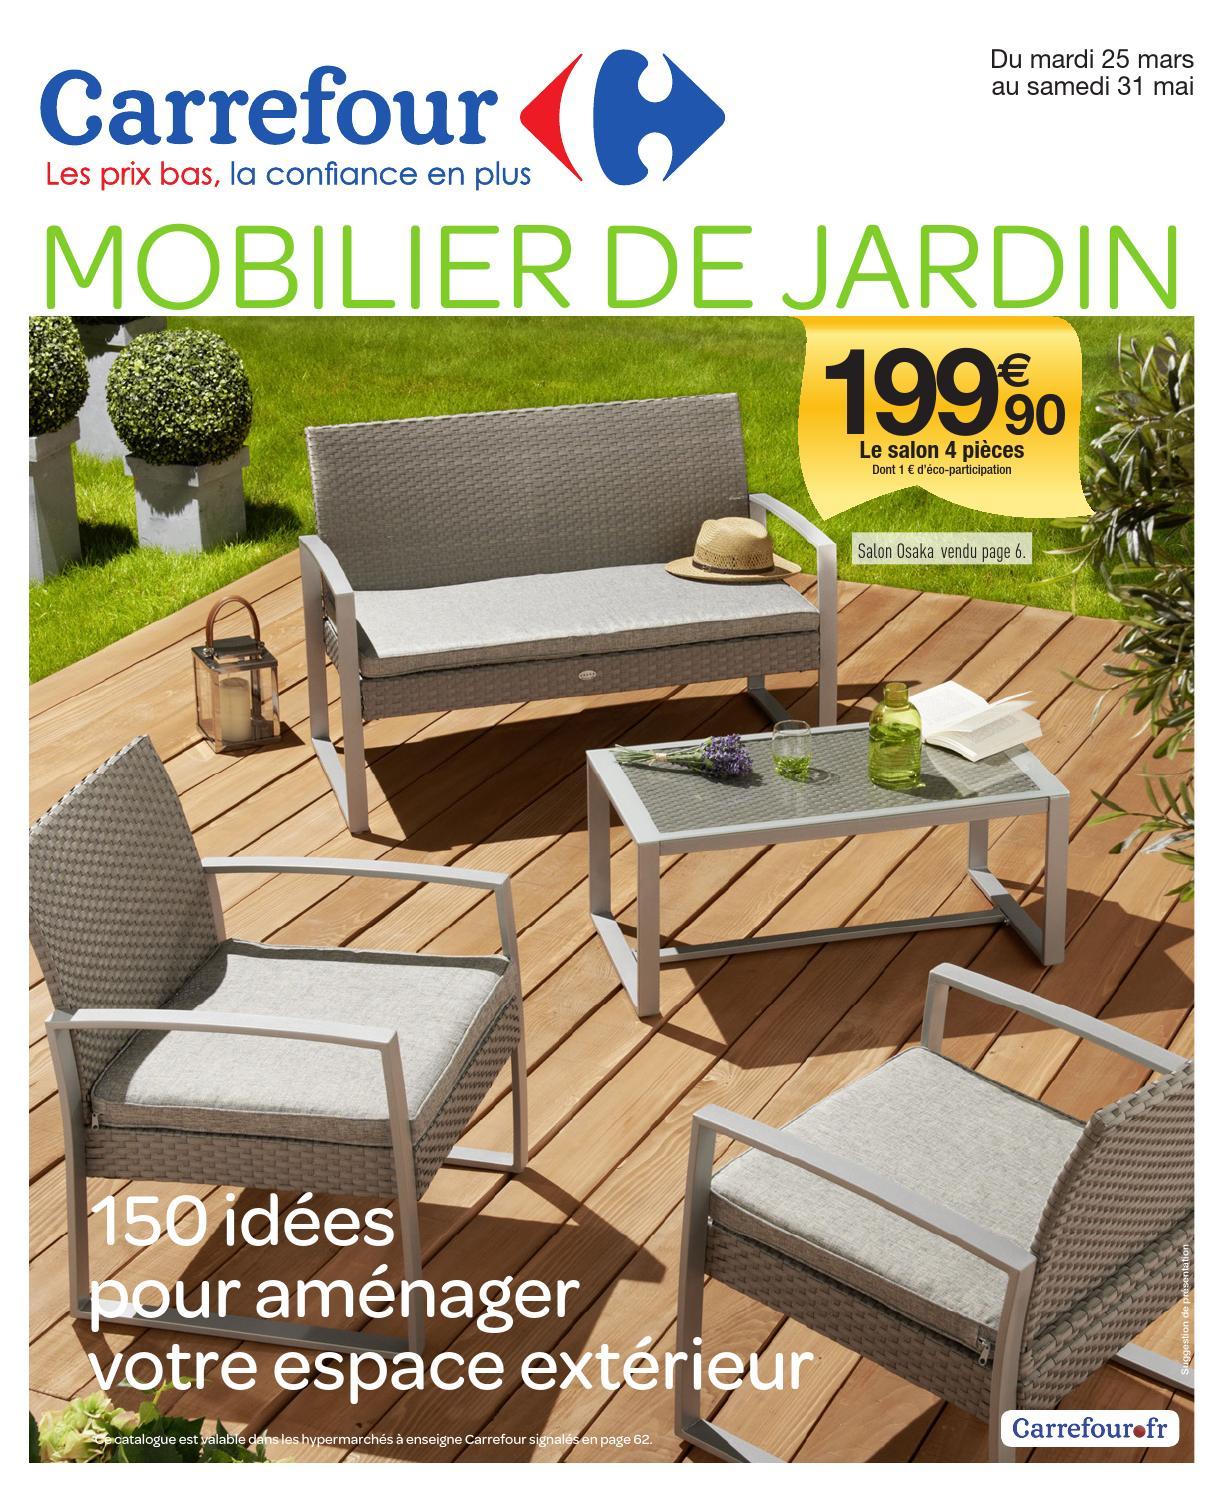 Catalogue Carrefour - 25.03-31.05.2014 By Joe Monroe - Issuu intérieur Balancelle Jardin Carrefour